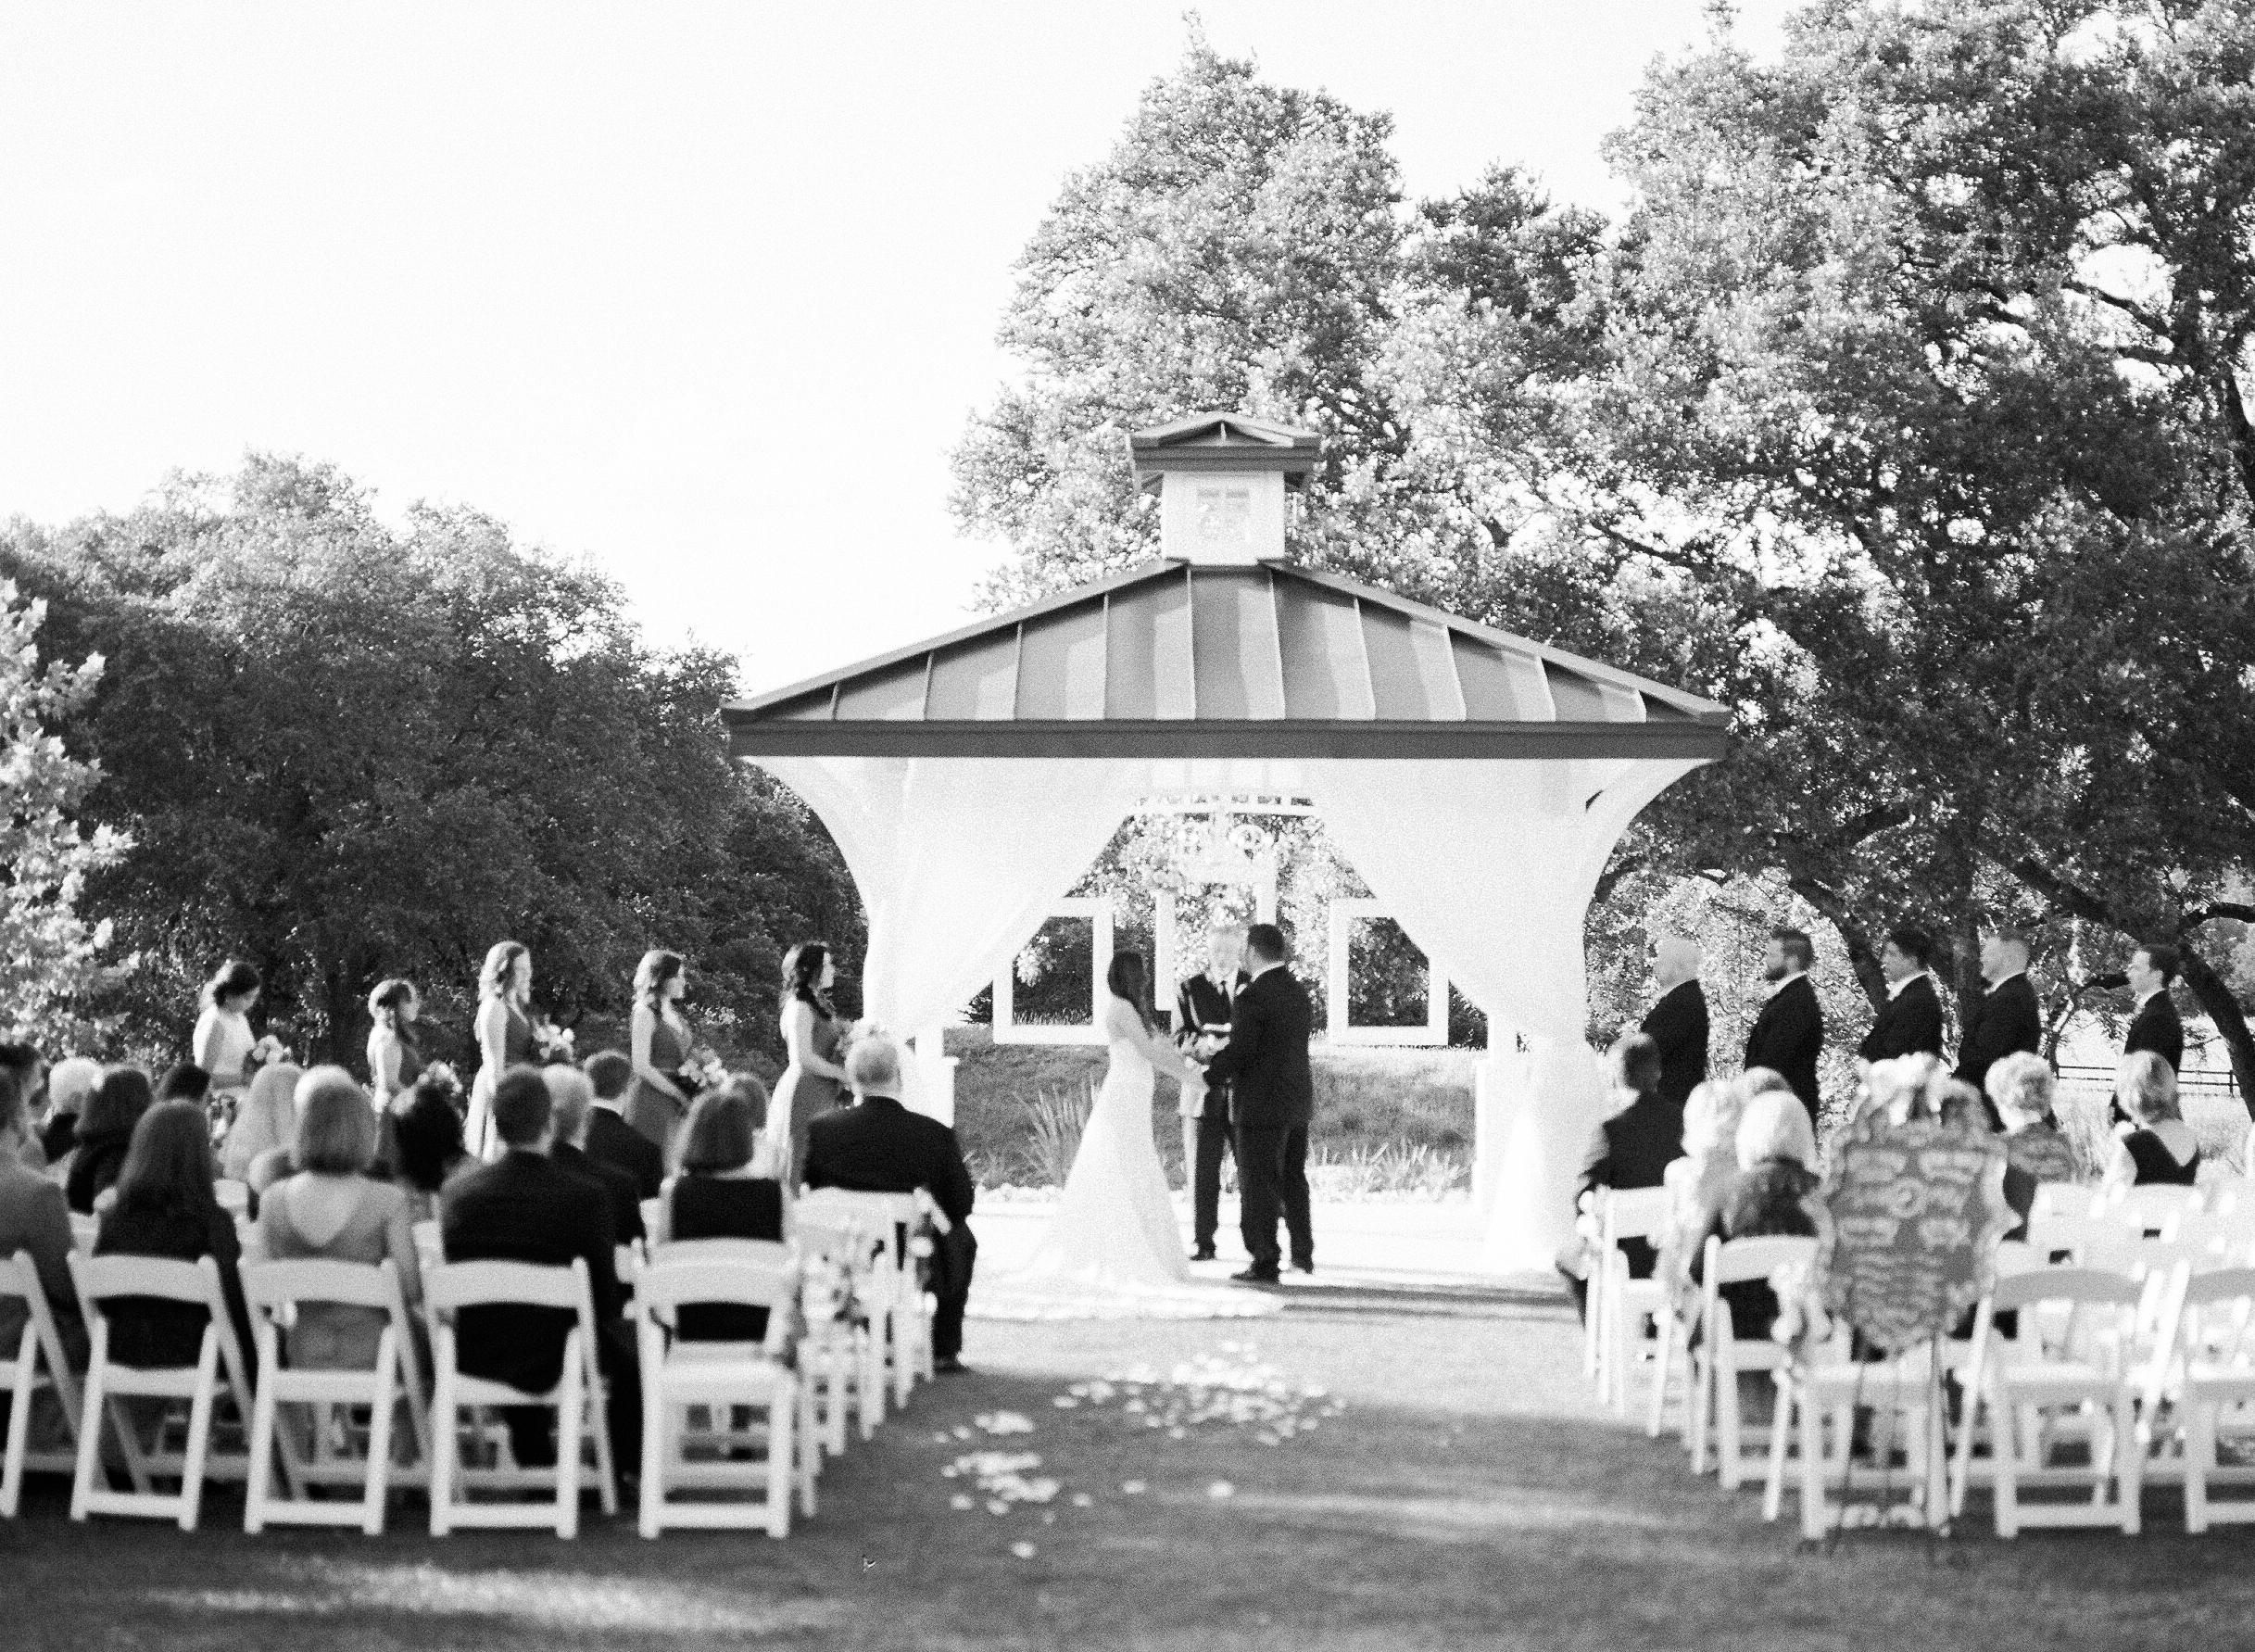 San-Antonio-Wedding-Tara-Austin-8.jpg